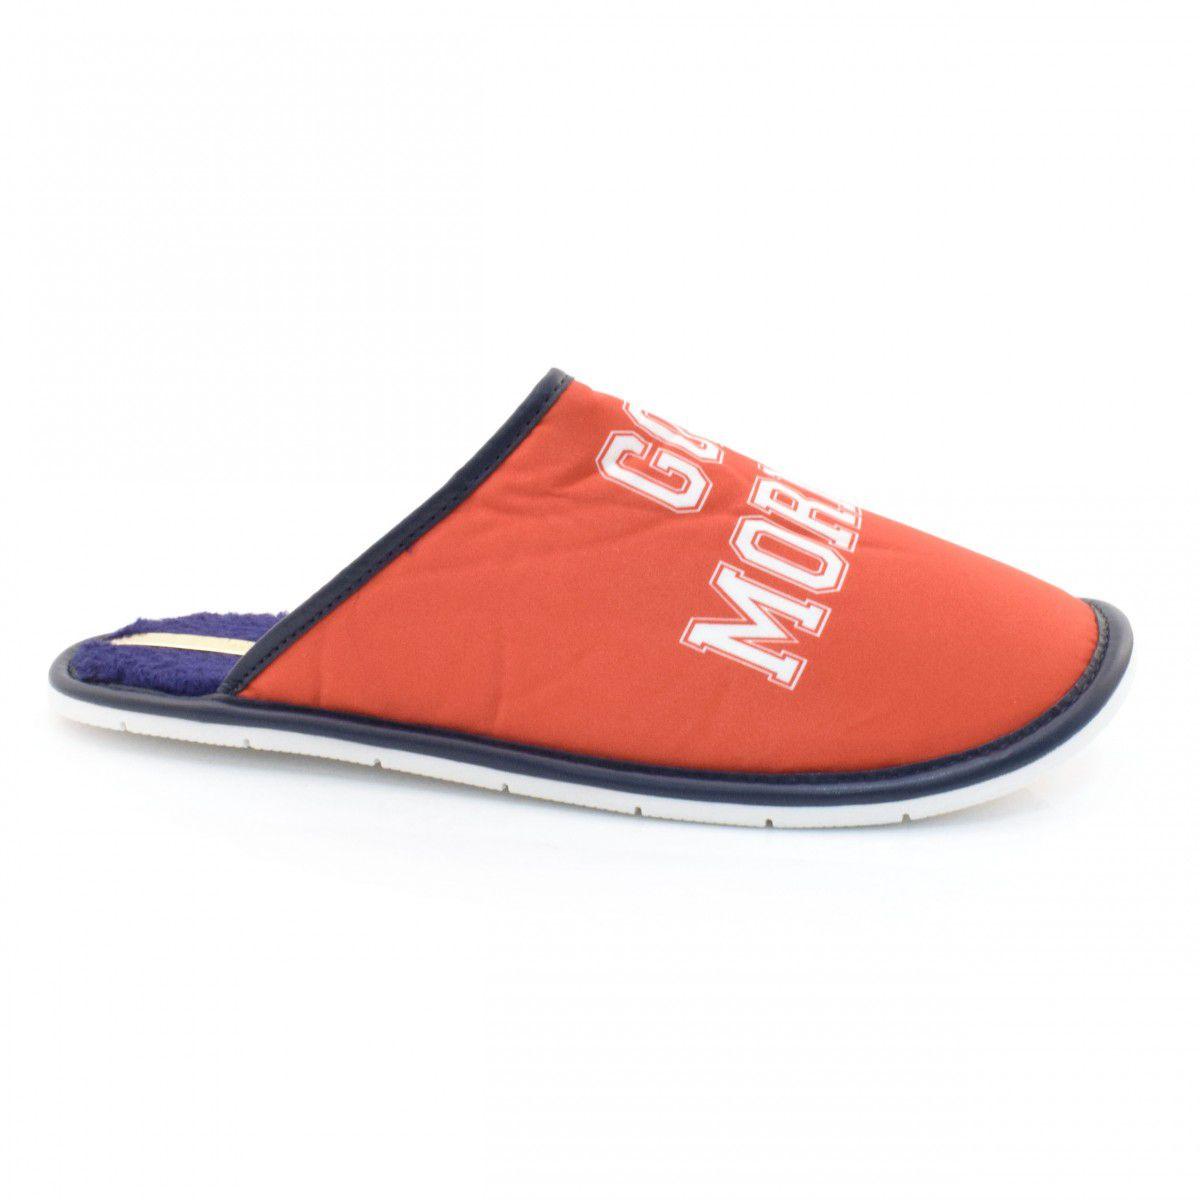 Pantufa Moleca  5427101 Vermelho/ Azul